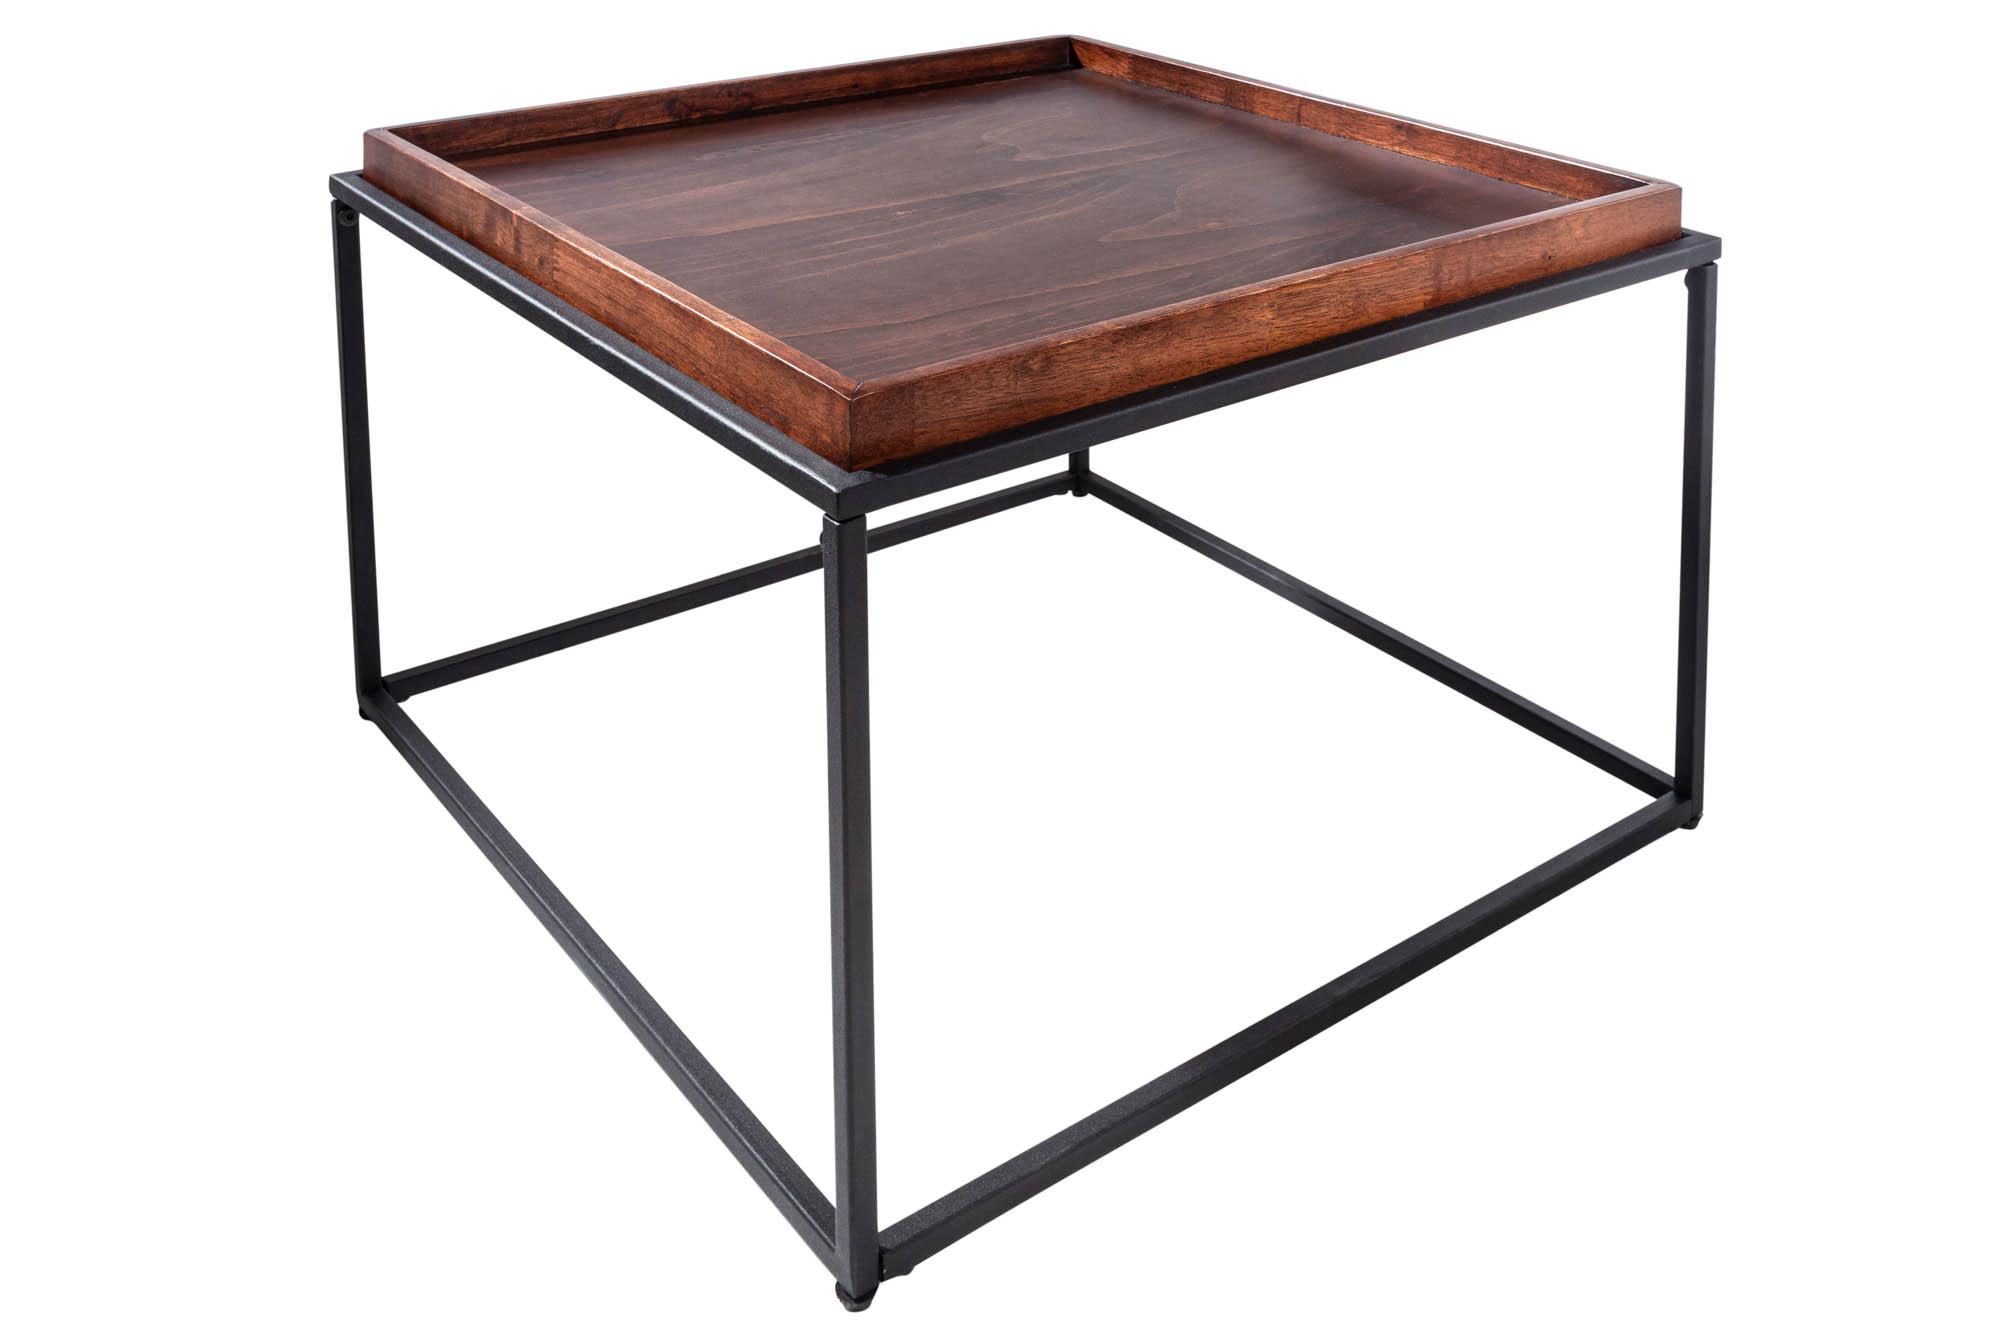 Coffee Table Elements Dark Brown-Black 60x60x40cm